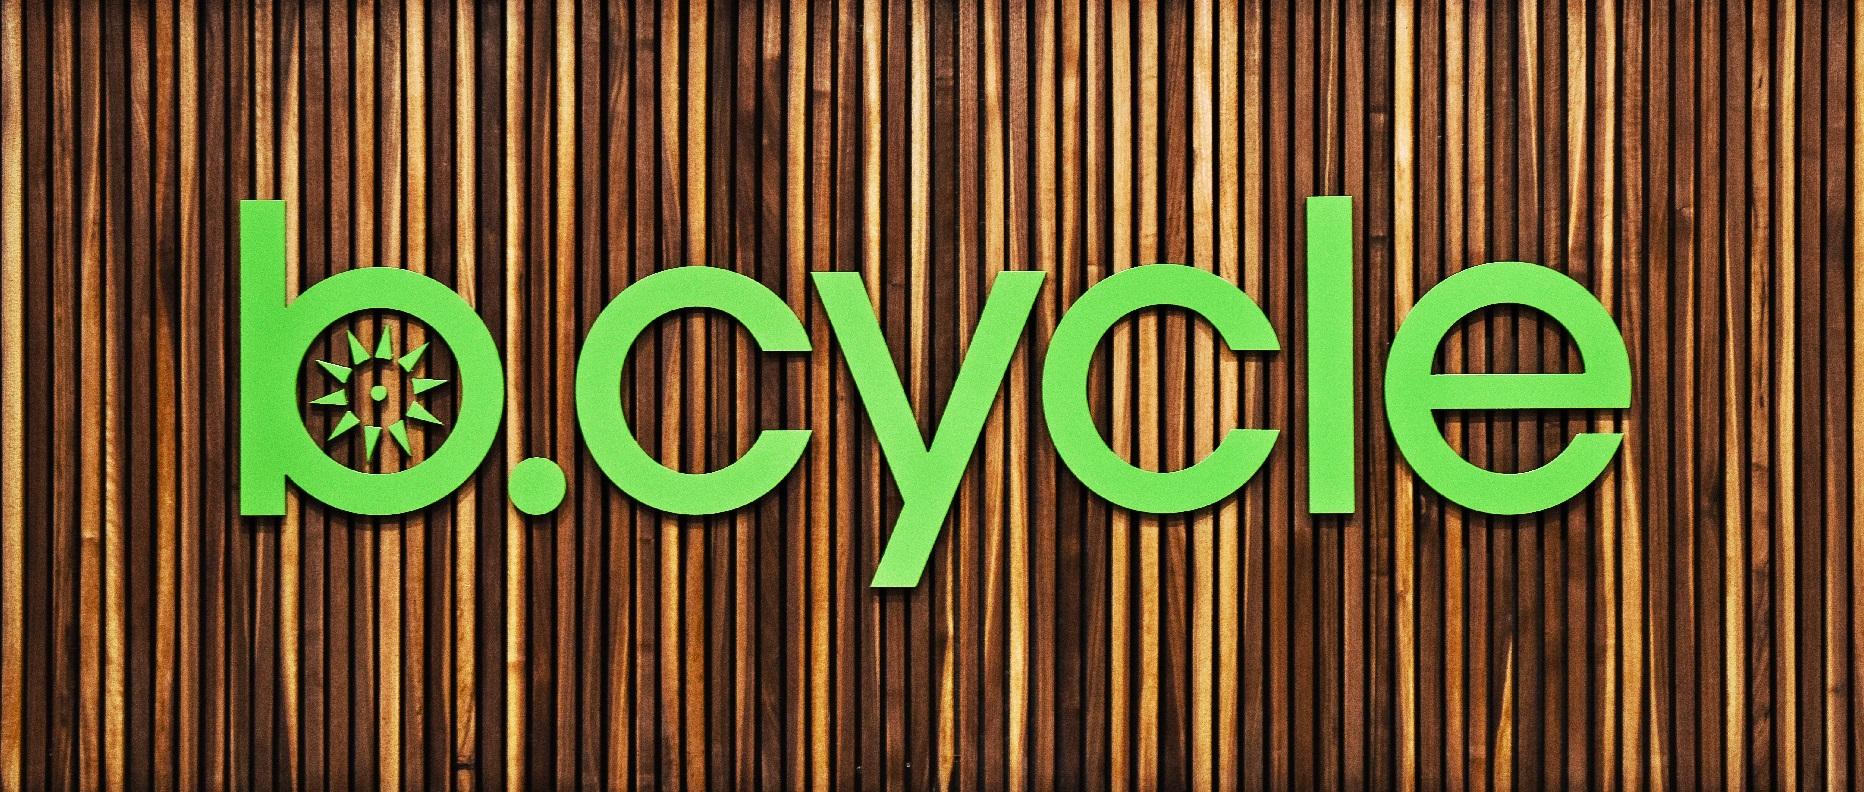 Crédit : B.Cycle